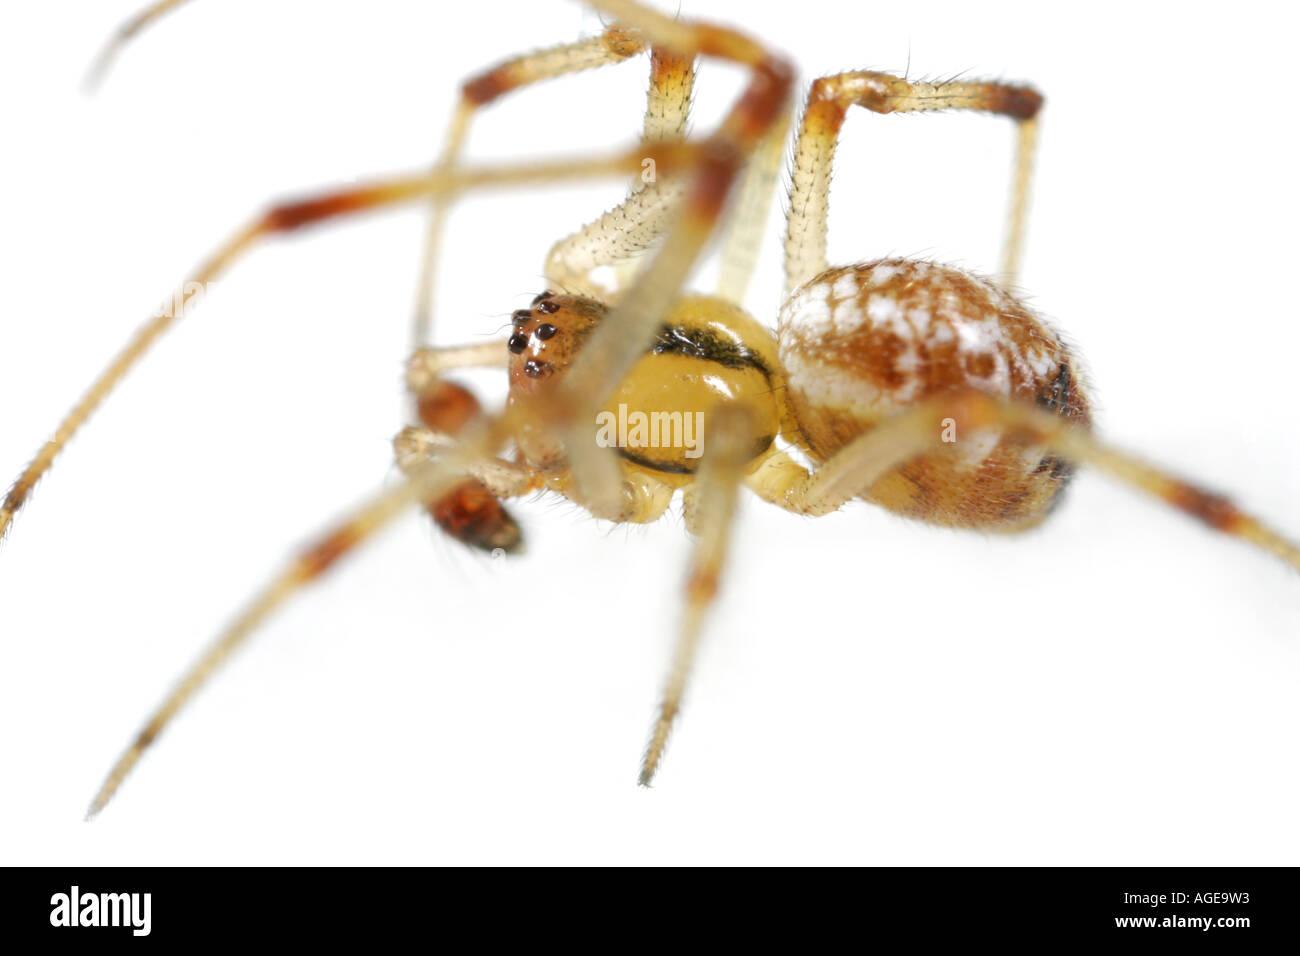 Theridion impressum spider - Stock Image